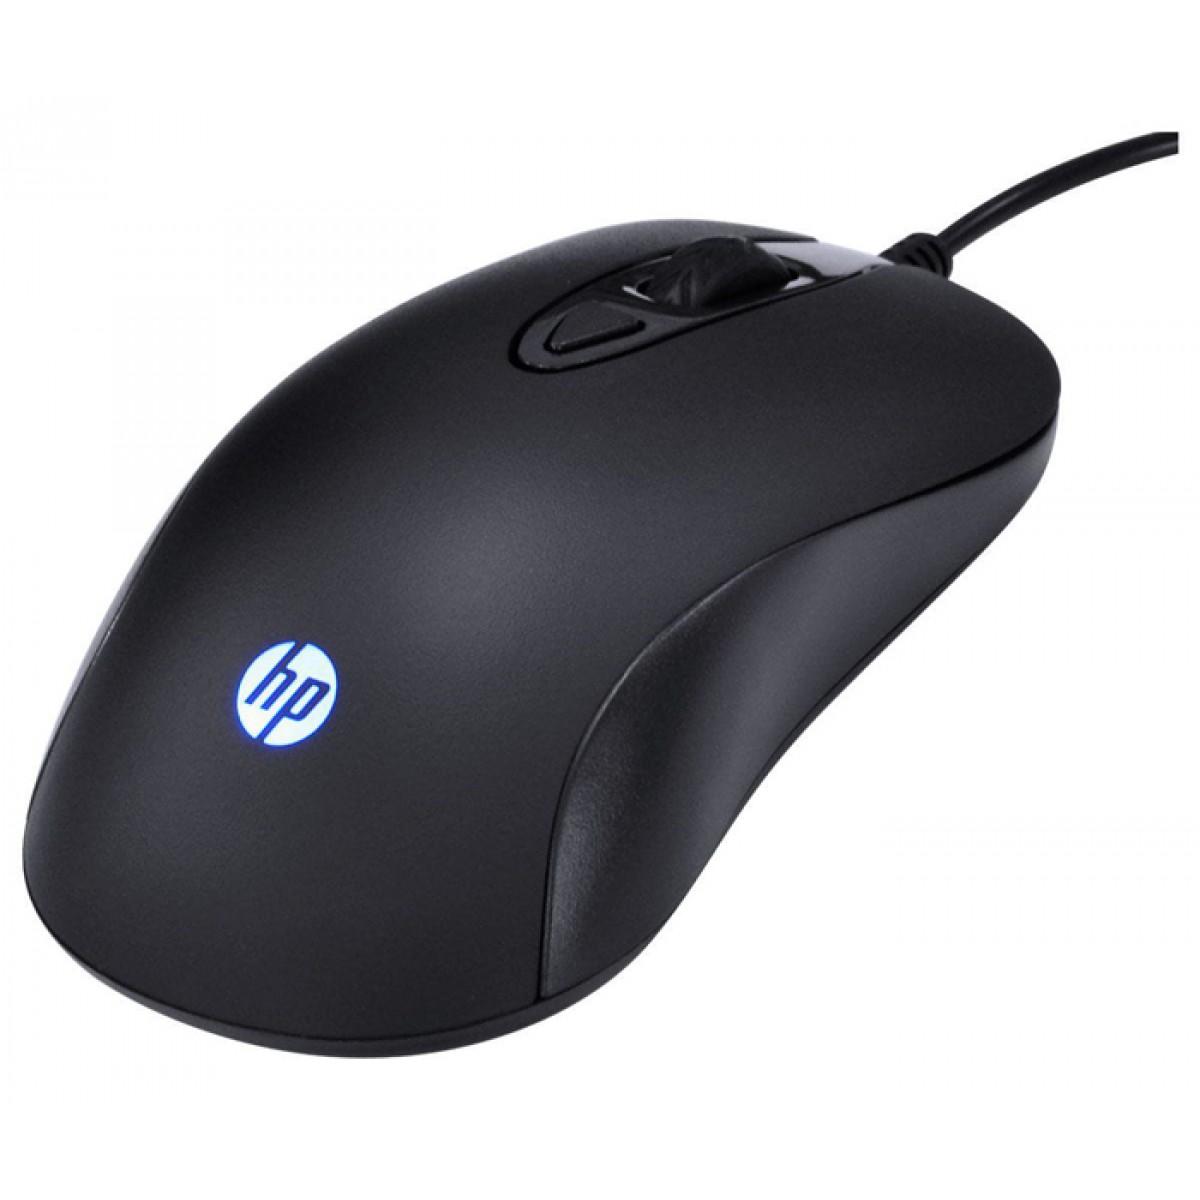 Combo Teclado e Mouse HP KM100, 1600 DPI, Black